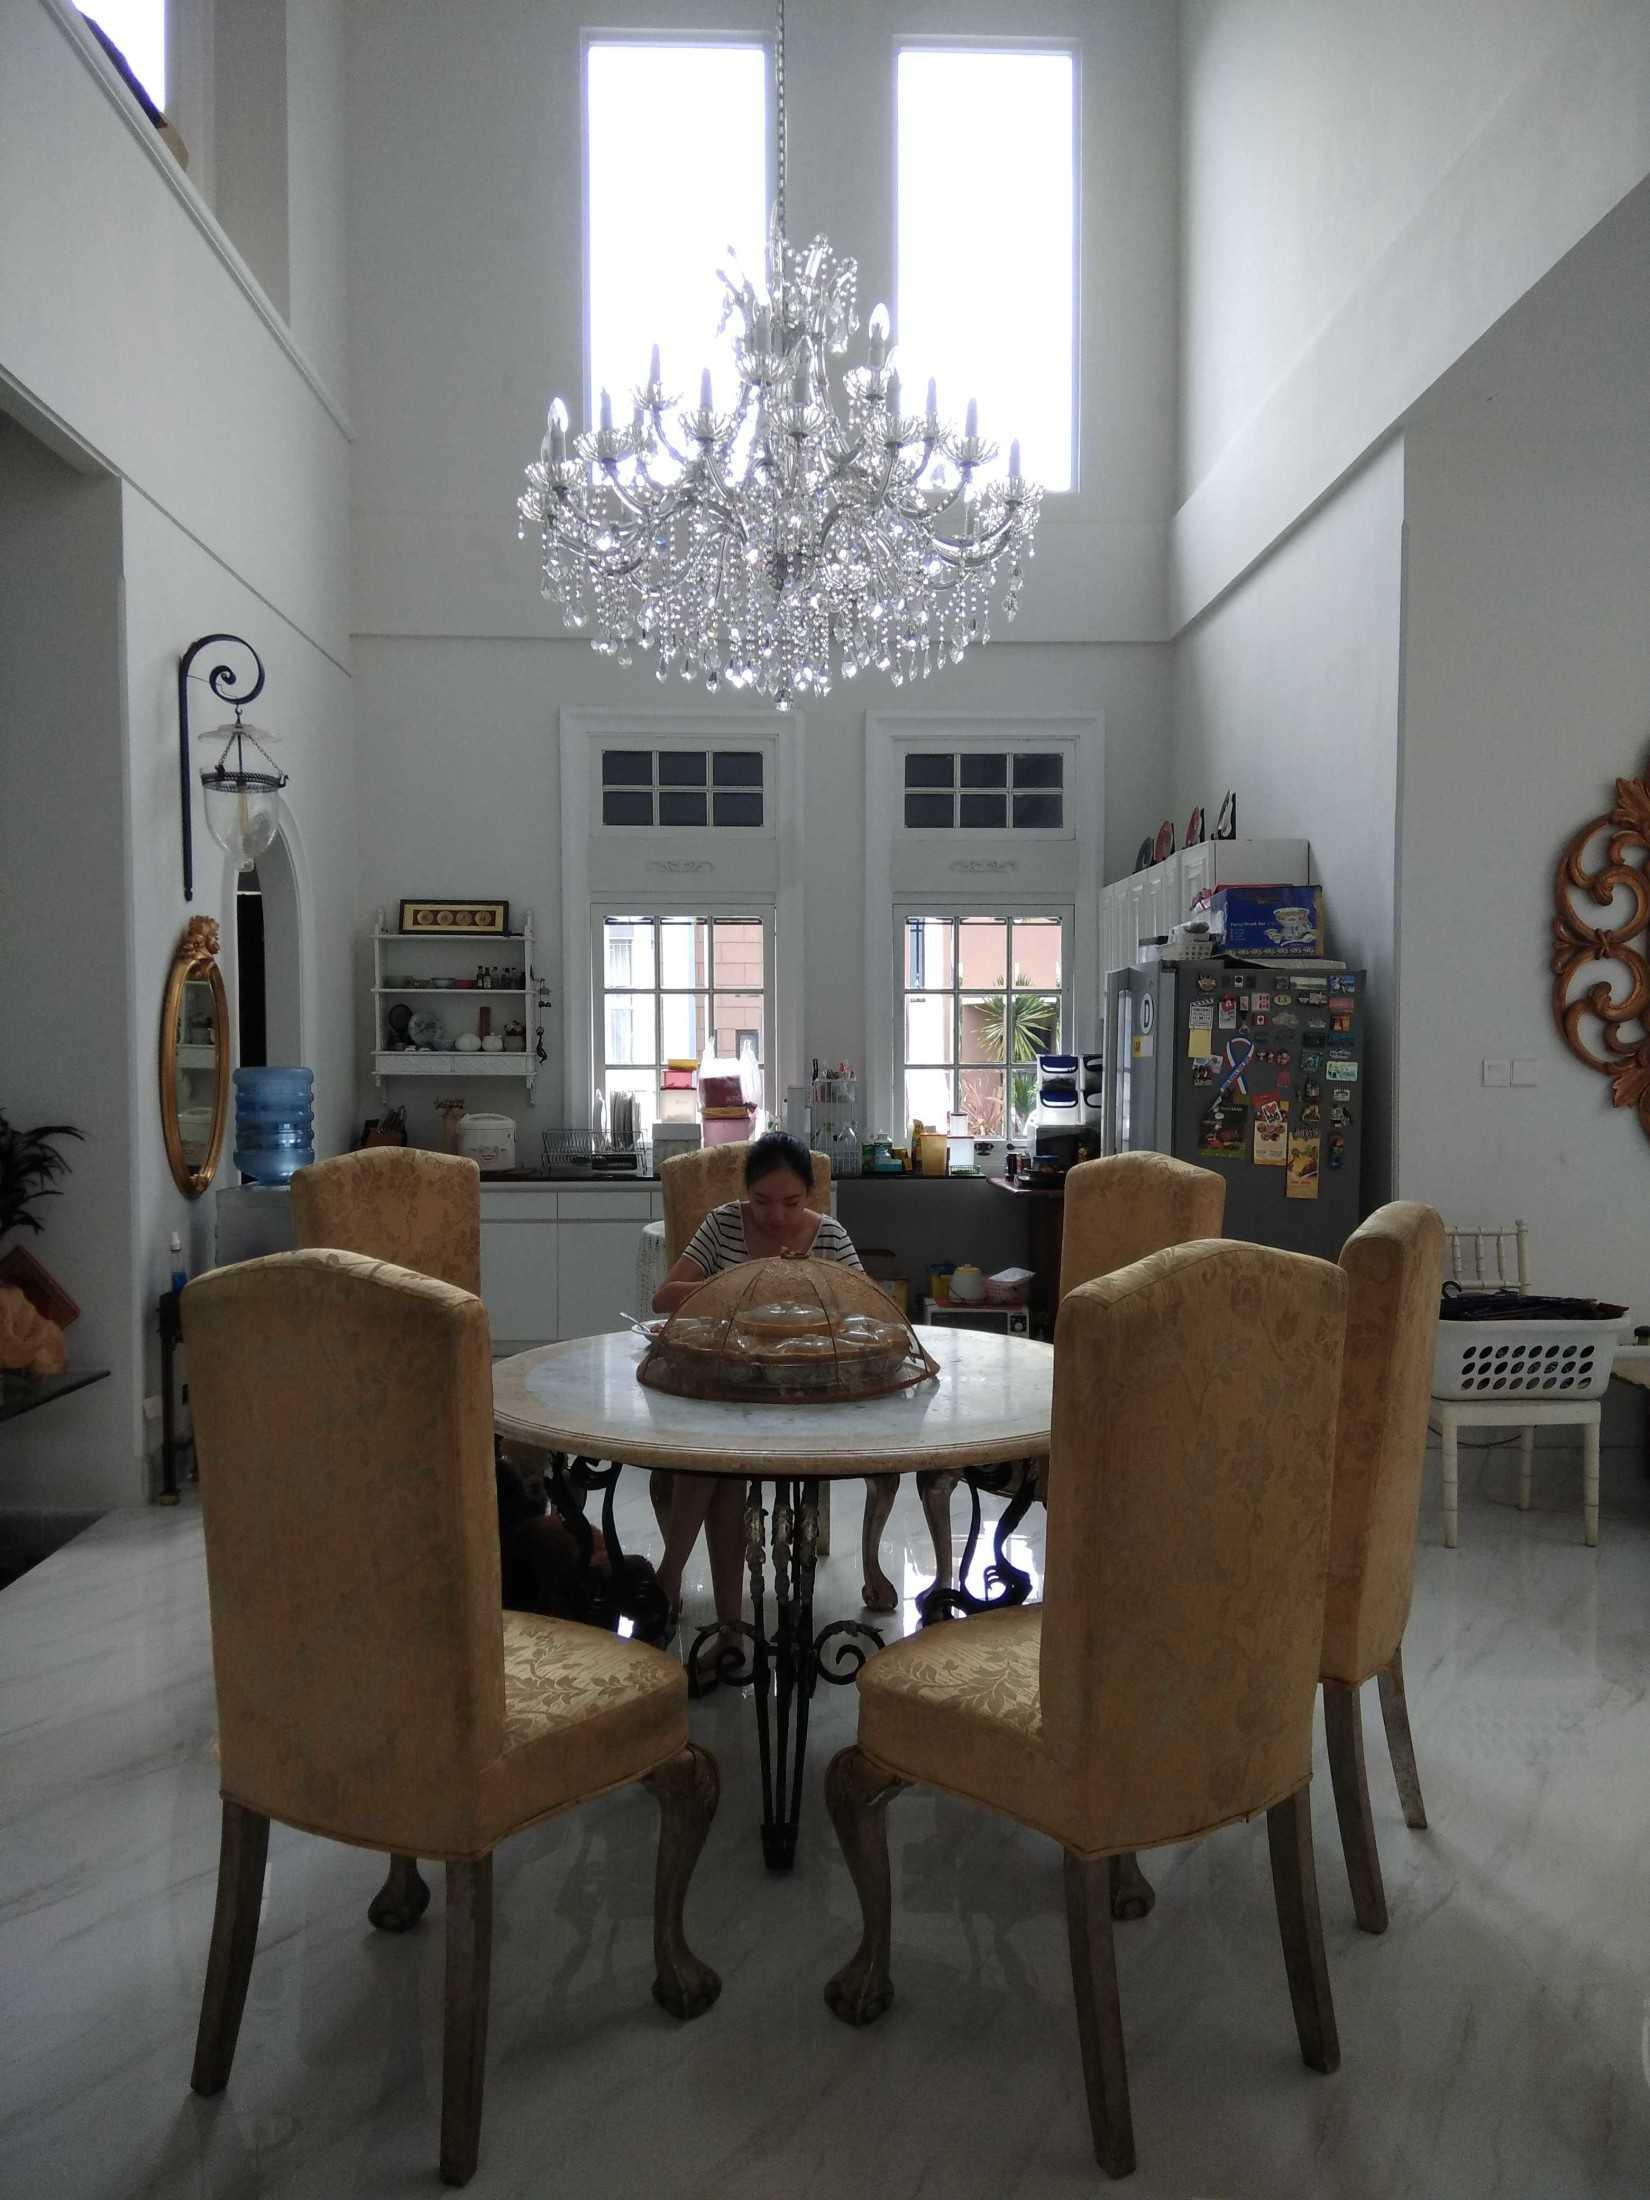 Mandala Architecture The Green Bsd Jl. Buaran - Rw. Buntu No.51, Cilenggang, Kec. Serpong, Kota Tangerang Selatan, Banten 15310, Indonesia Jl. Buaran - Rw. Buntu No.51, Cilenggang, Kec. Serpong, Kota Tangerang Selatan, Banten 15310, Indonesia Mandala-Architecture-The-Green-Bsd  83533